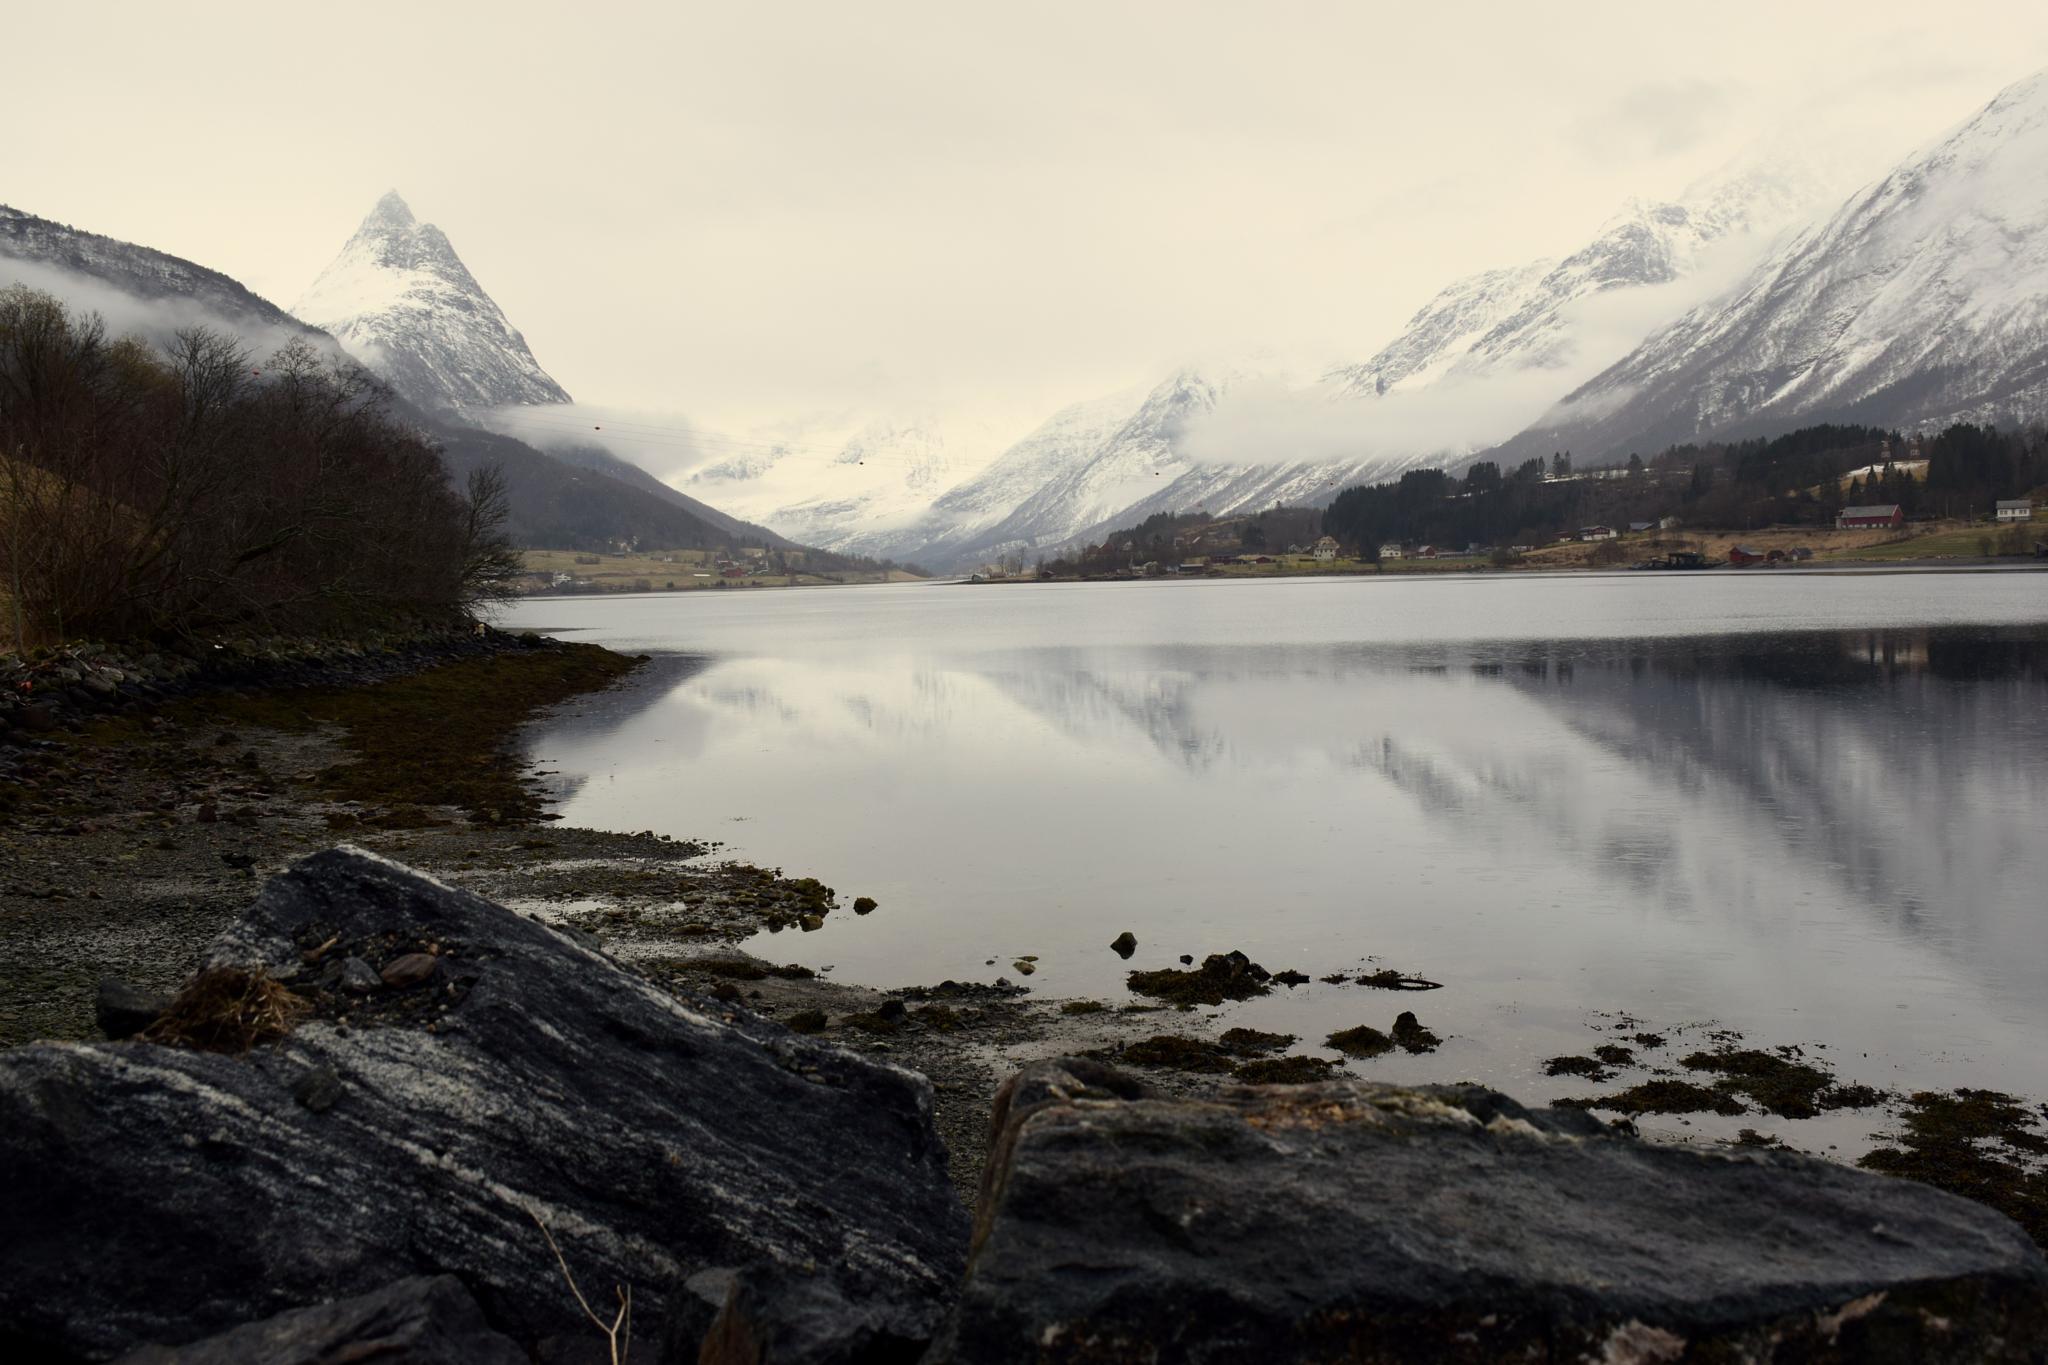 #Fjord#Mountain#Snow# by anne.l.brunstad